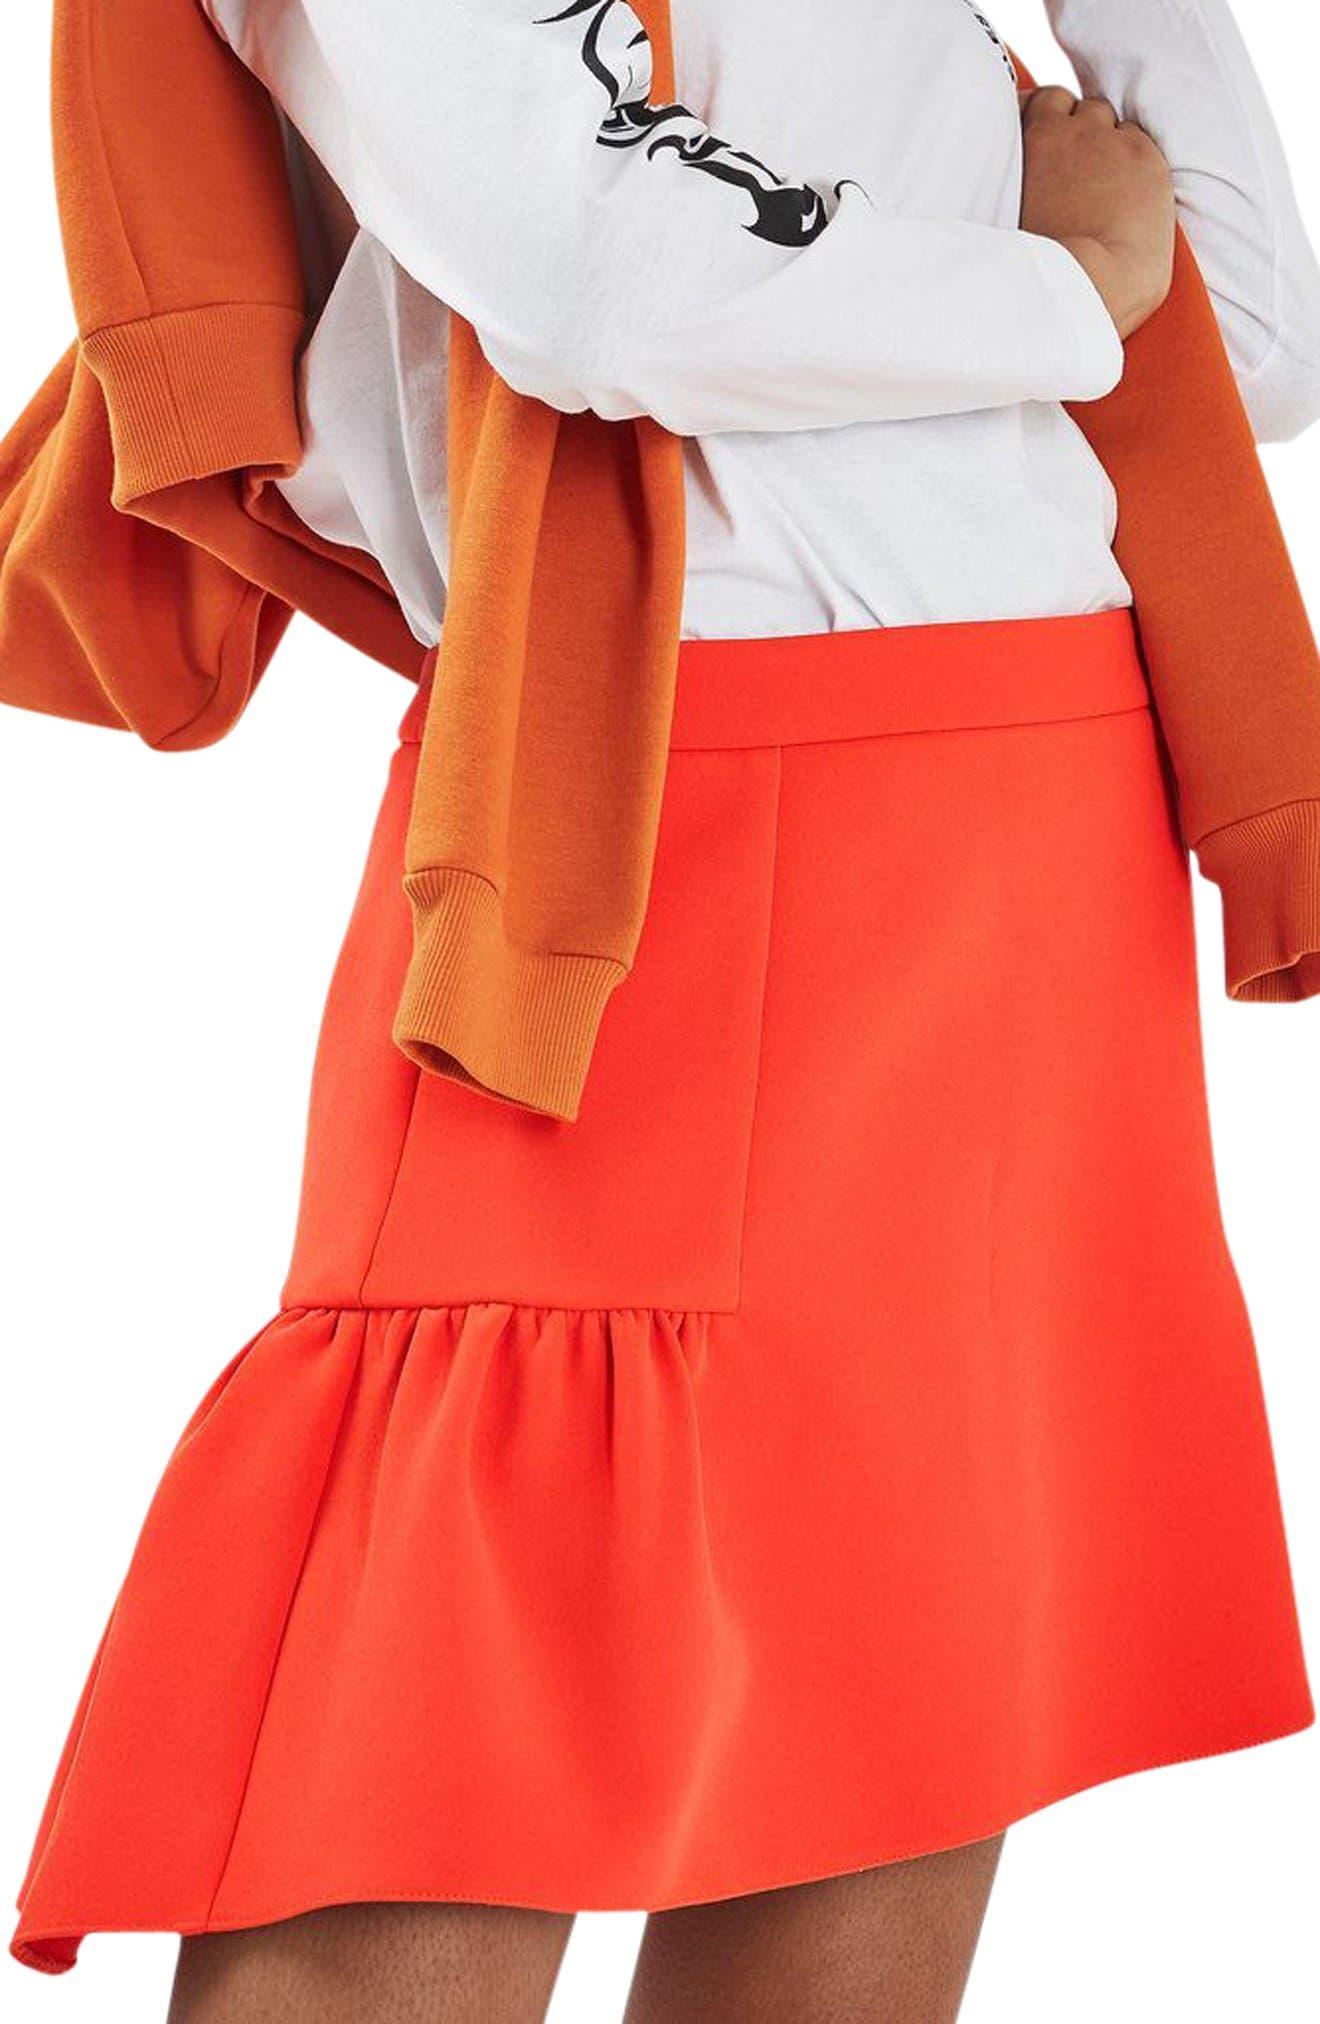 Alternate Image 1 Selected - Topshop Peplum Skirt